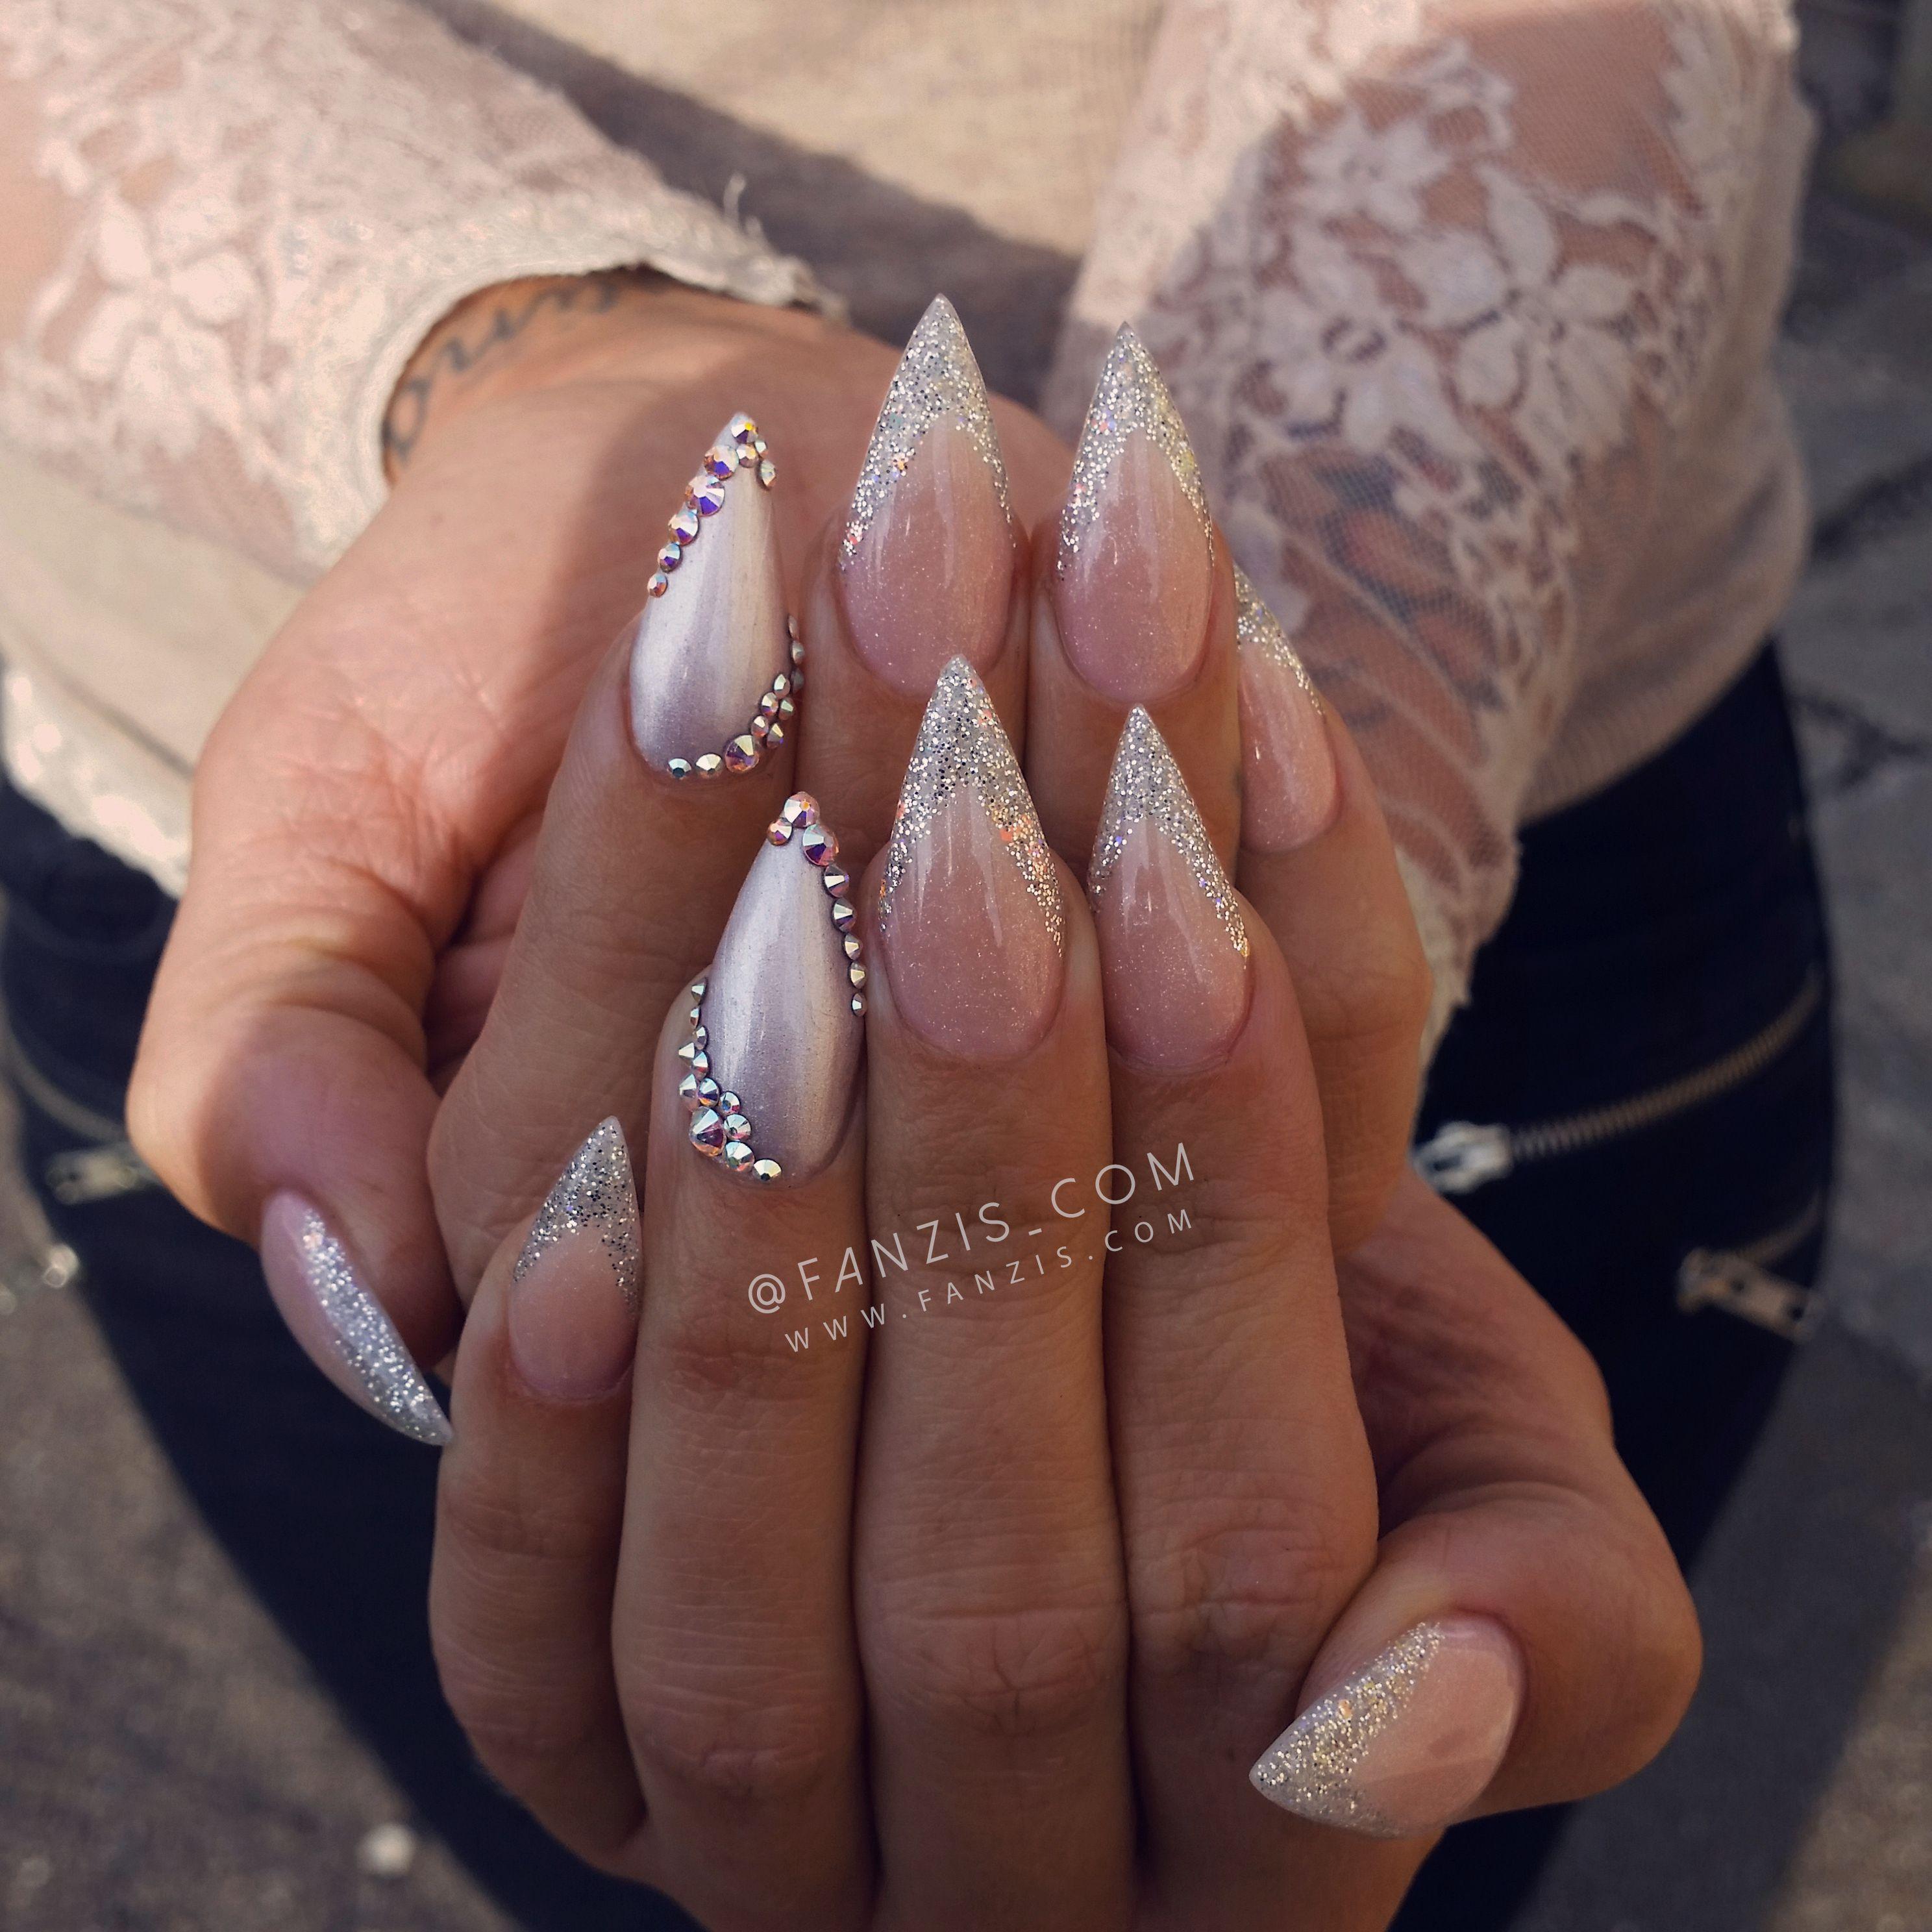 sharp #pointy #ice #silver #sparkling #glitter #nails | Nailvana ...